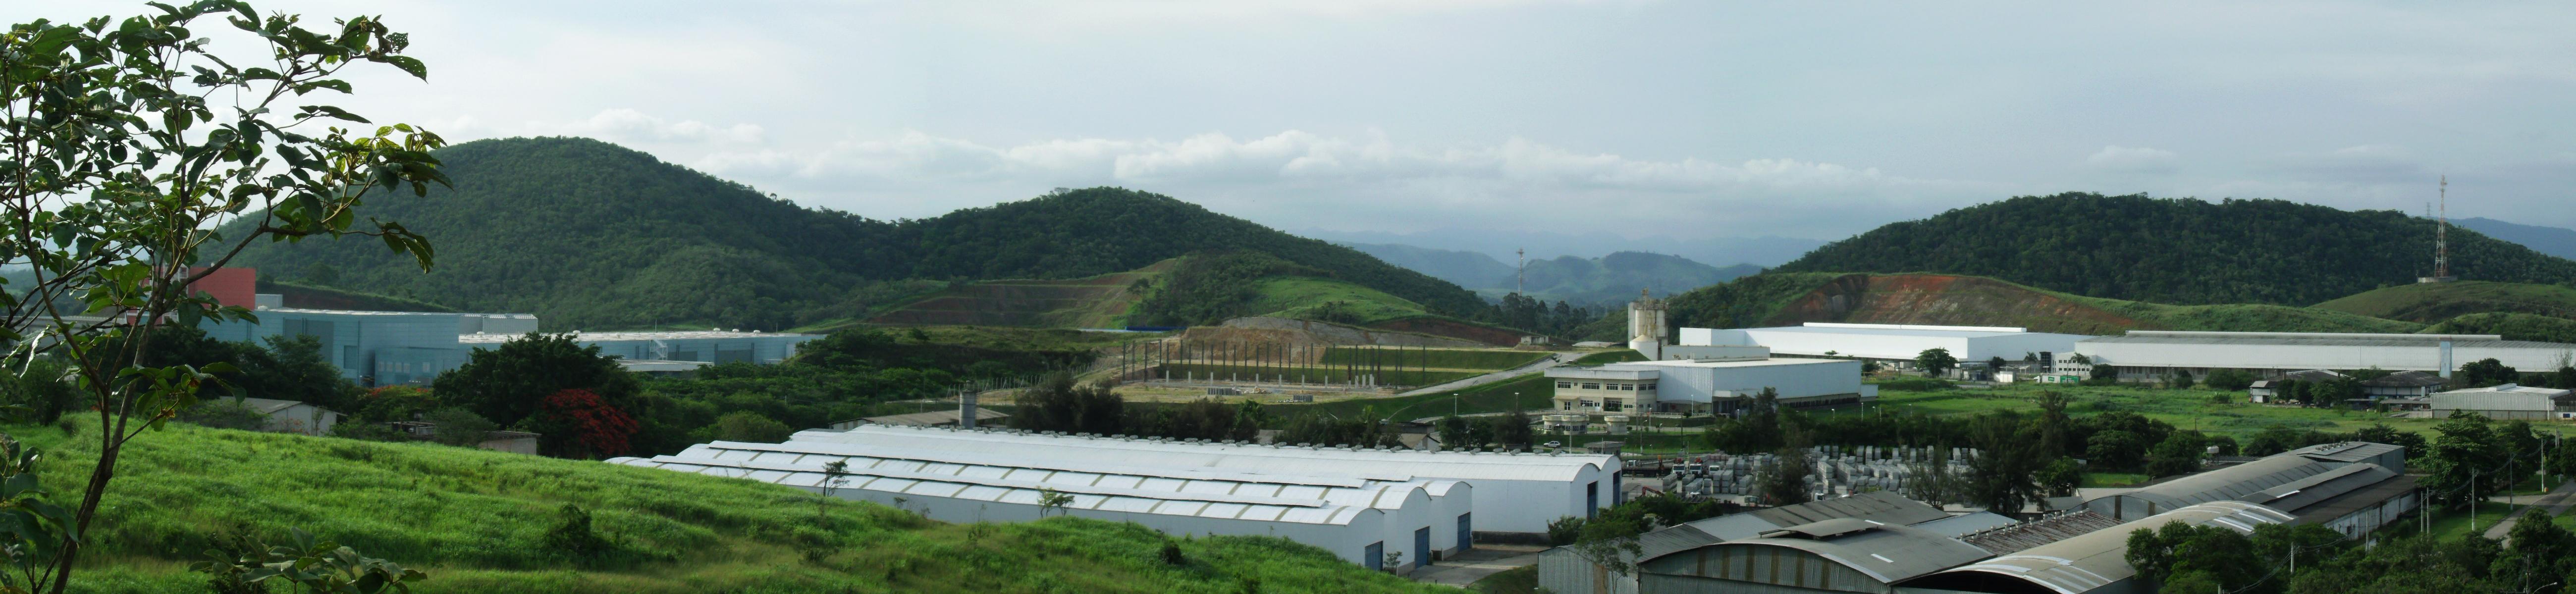 Distrito Industrial de Queimados. Foto: Douglas Mota/BaixadaZine